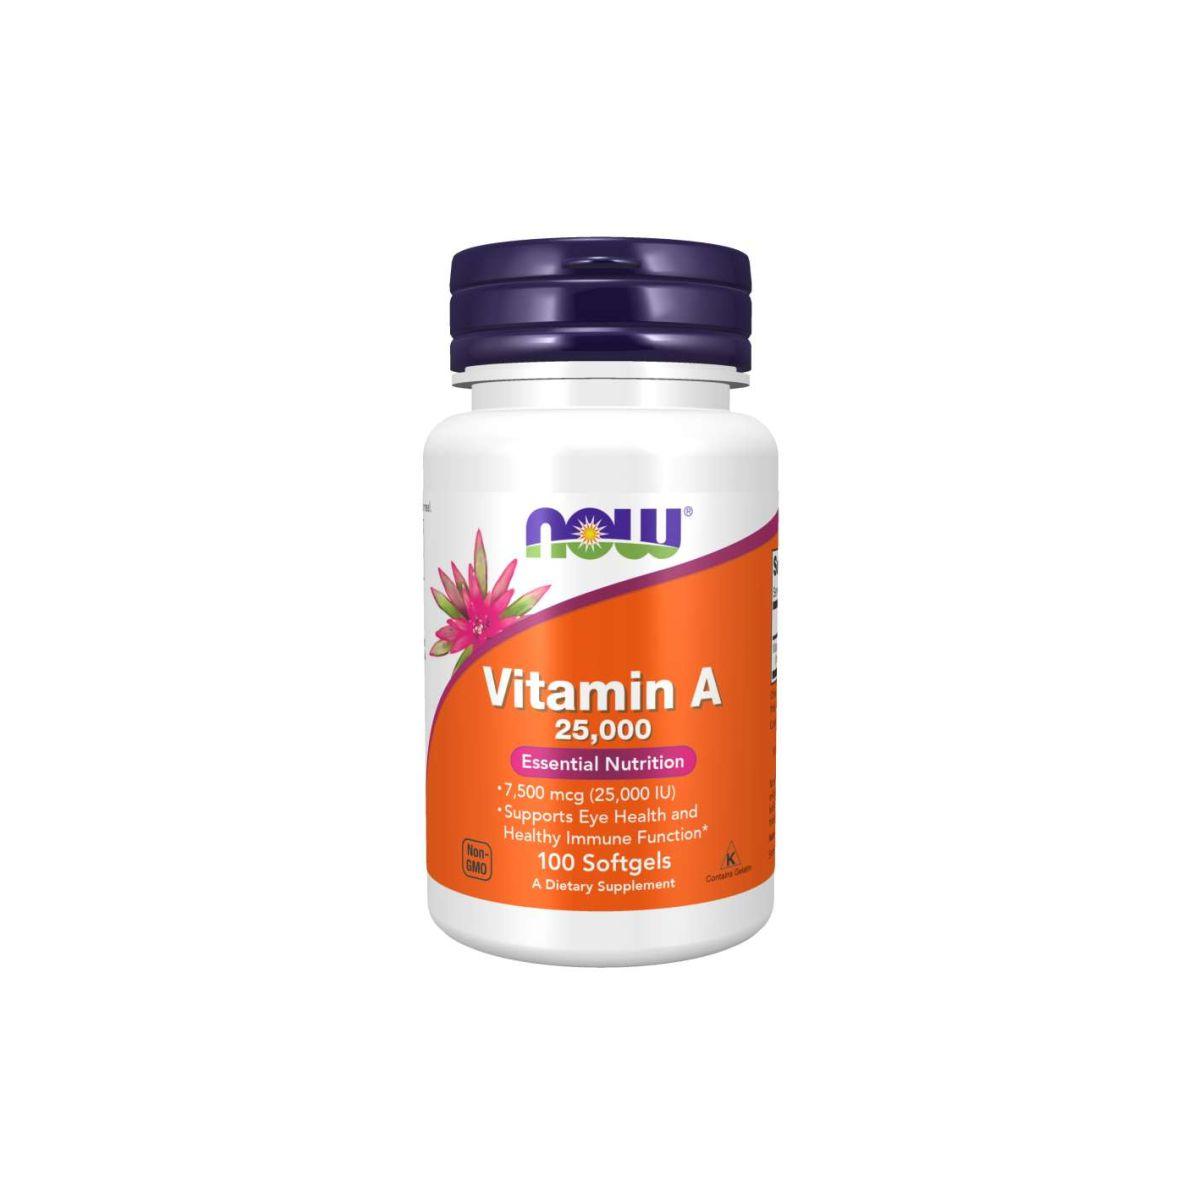 Vitamina A 25,000UI 100 Softgels - Now Foods